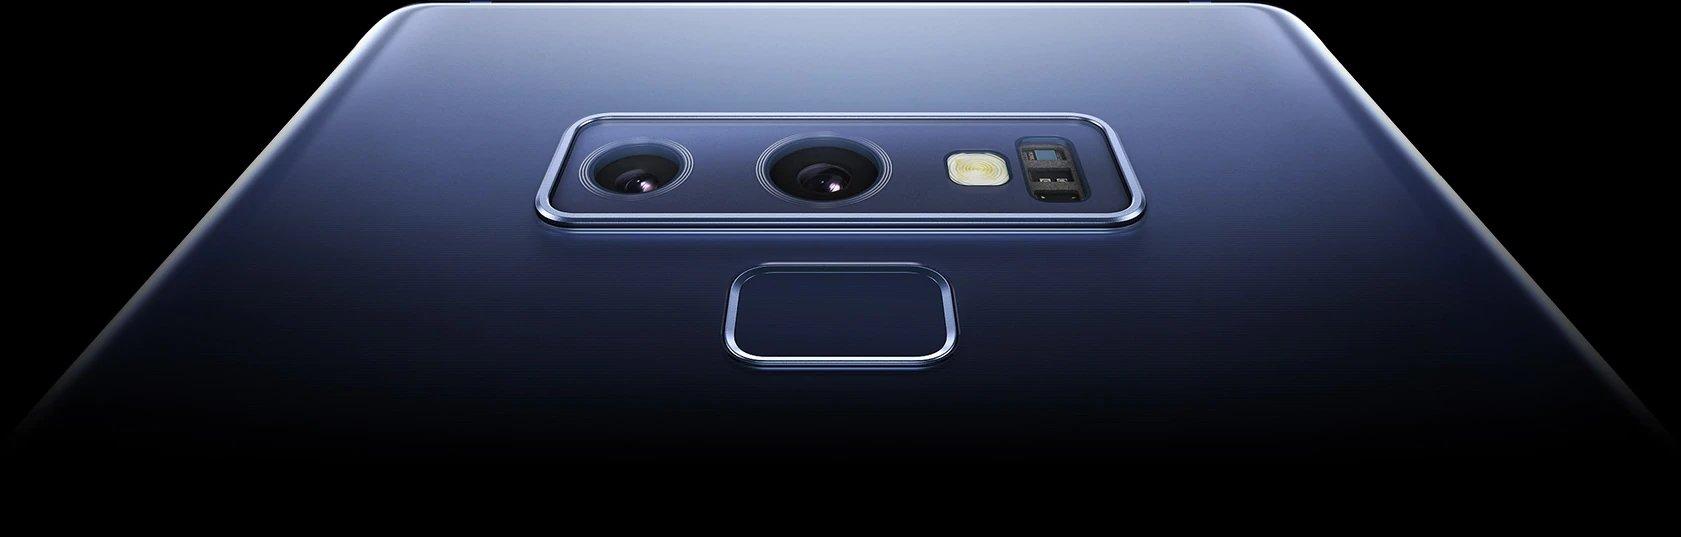 Фото 8 Samsung Galaxy Note 9